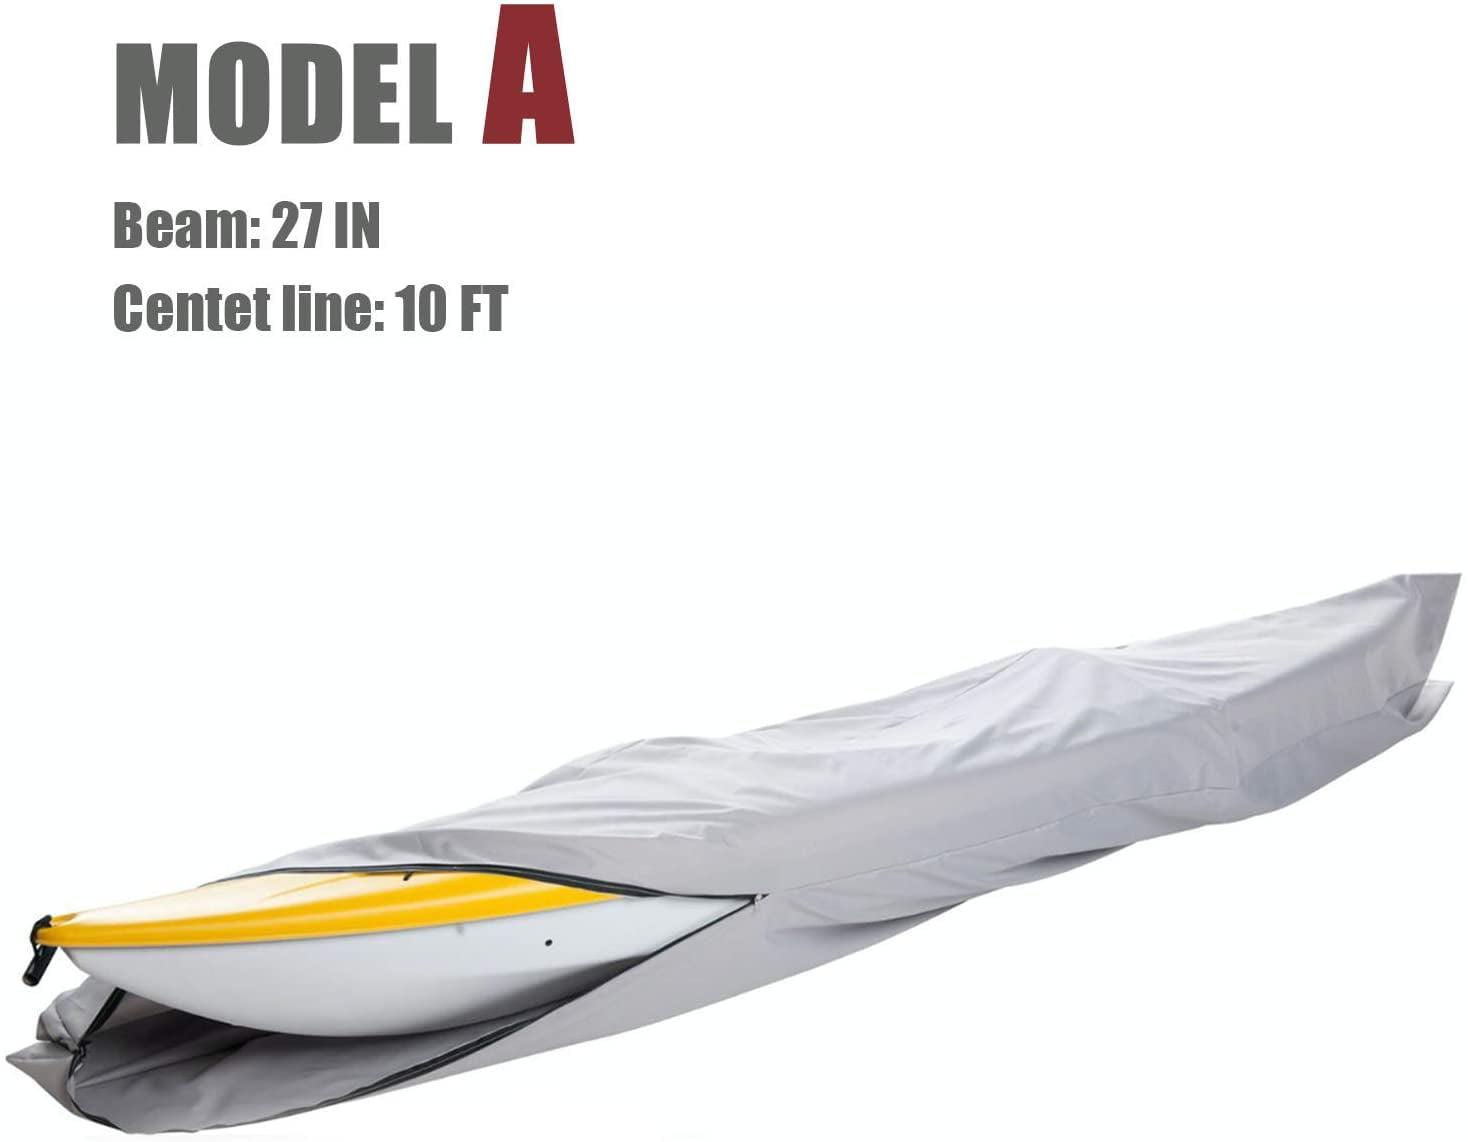 Premium 2.7-3m Kayak Canoe Boat Cover Heavy Duty Trailerable Waterproof Gray